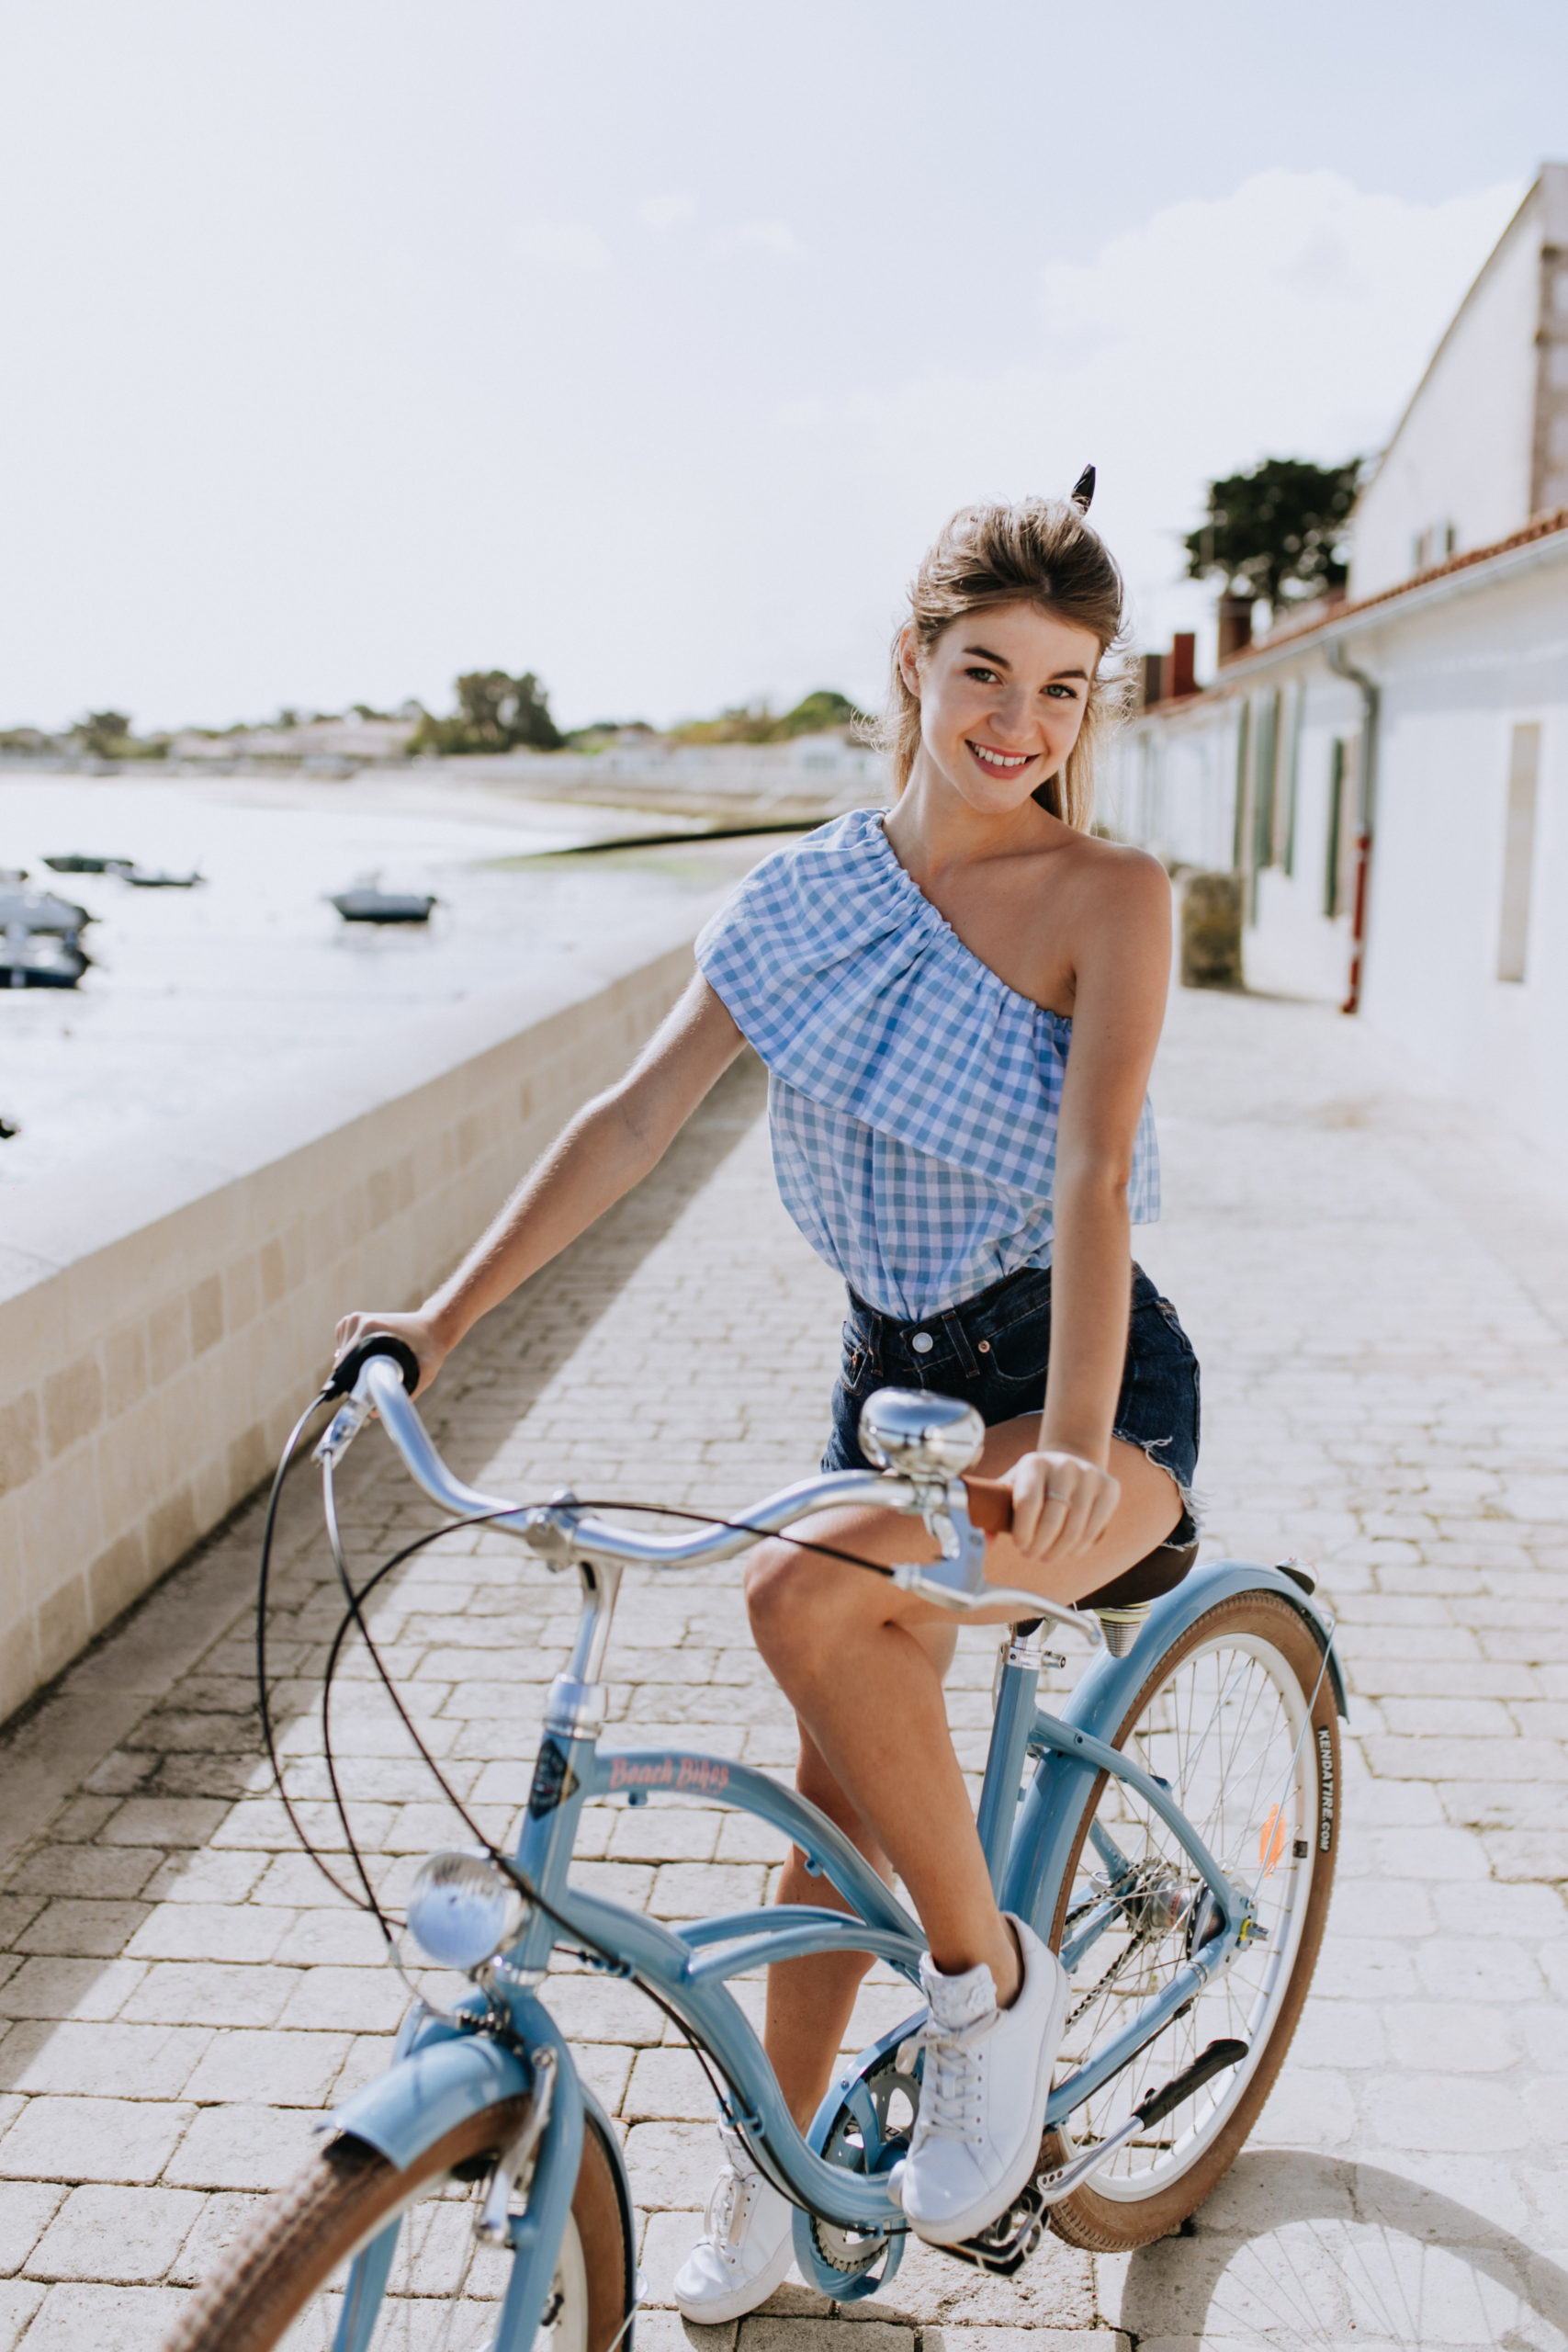 Beach bikes - Rivedoux Plage - Vélo